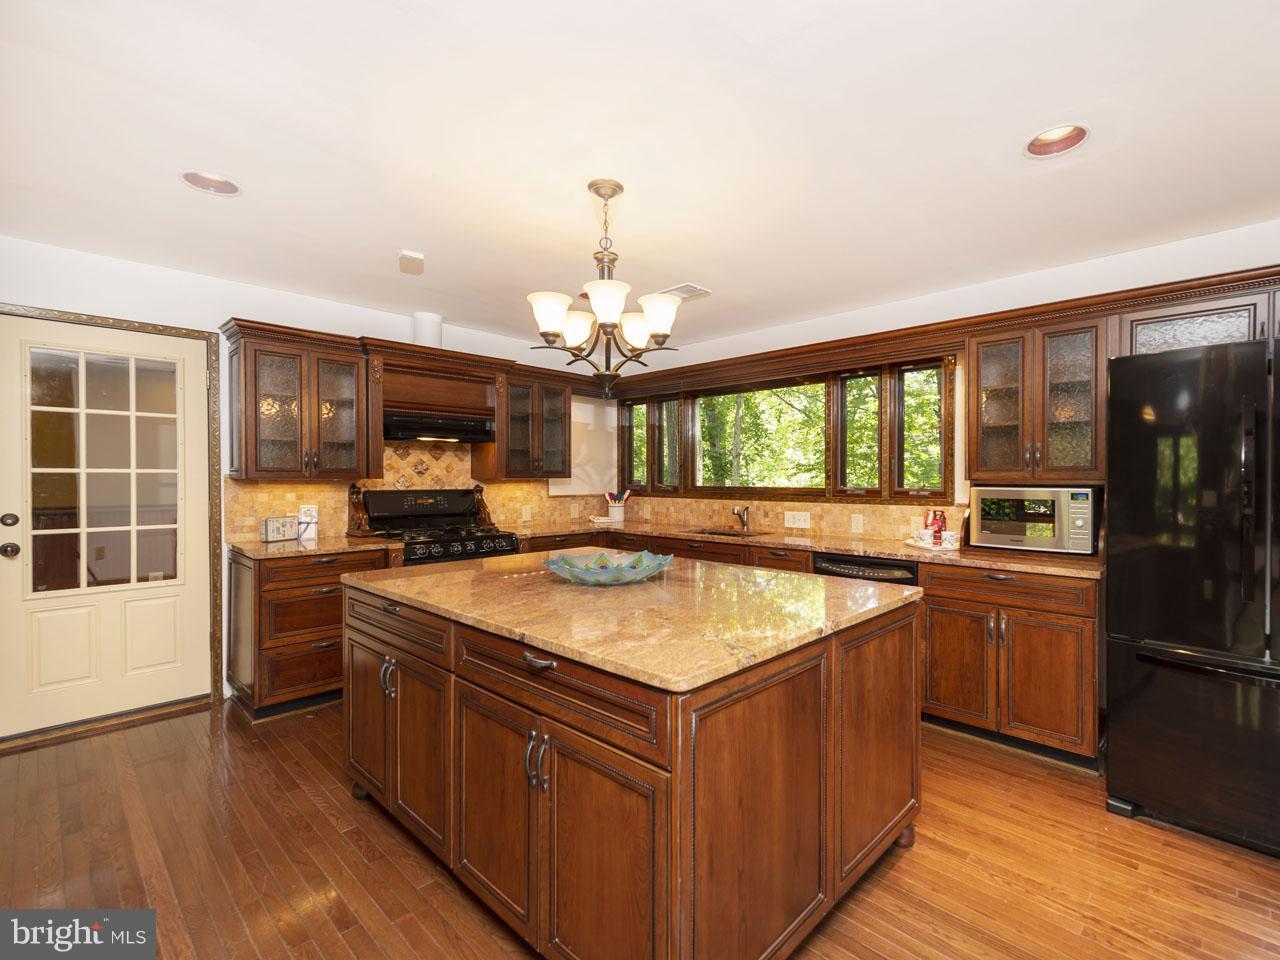 1002303700-300502419380-2021-07-22-03-27-23  |   | Alexandria Delaware Real Estate For Sale | MLS# 1002303700  - Best of Northern Virginia